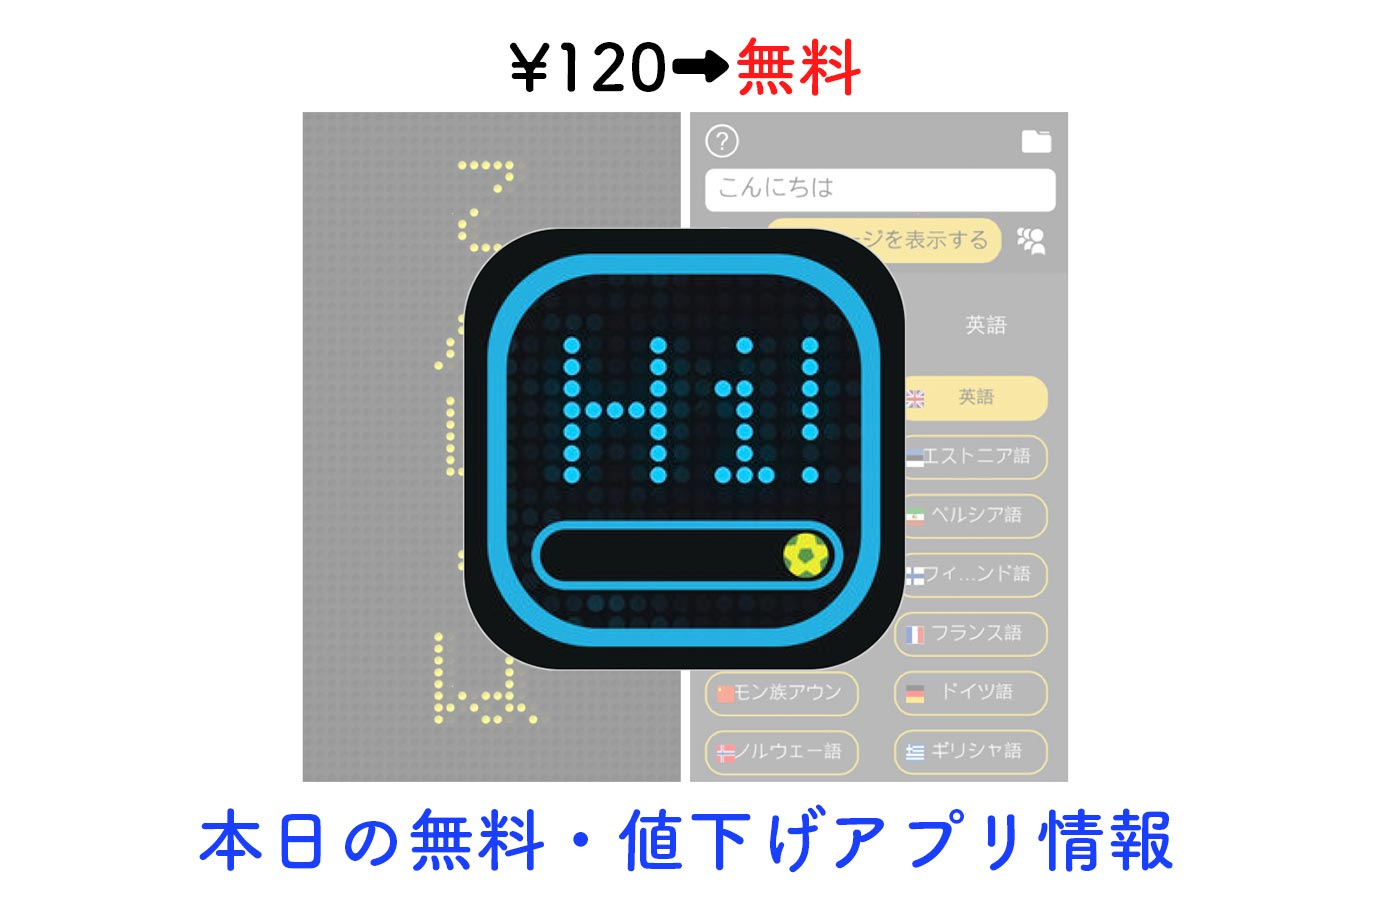 Appsale1231